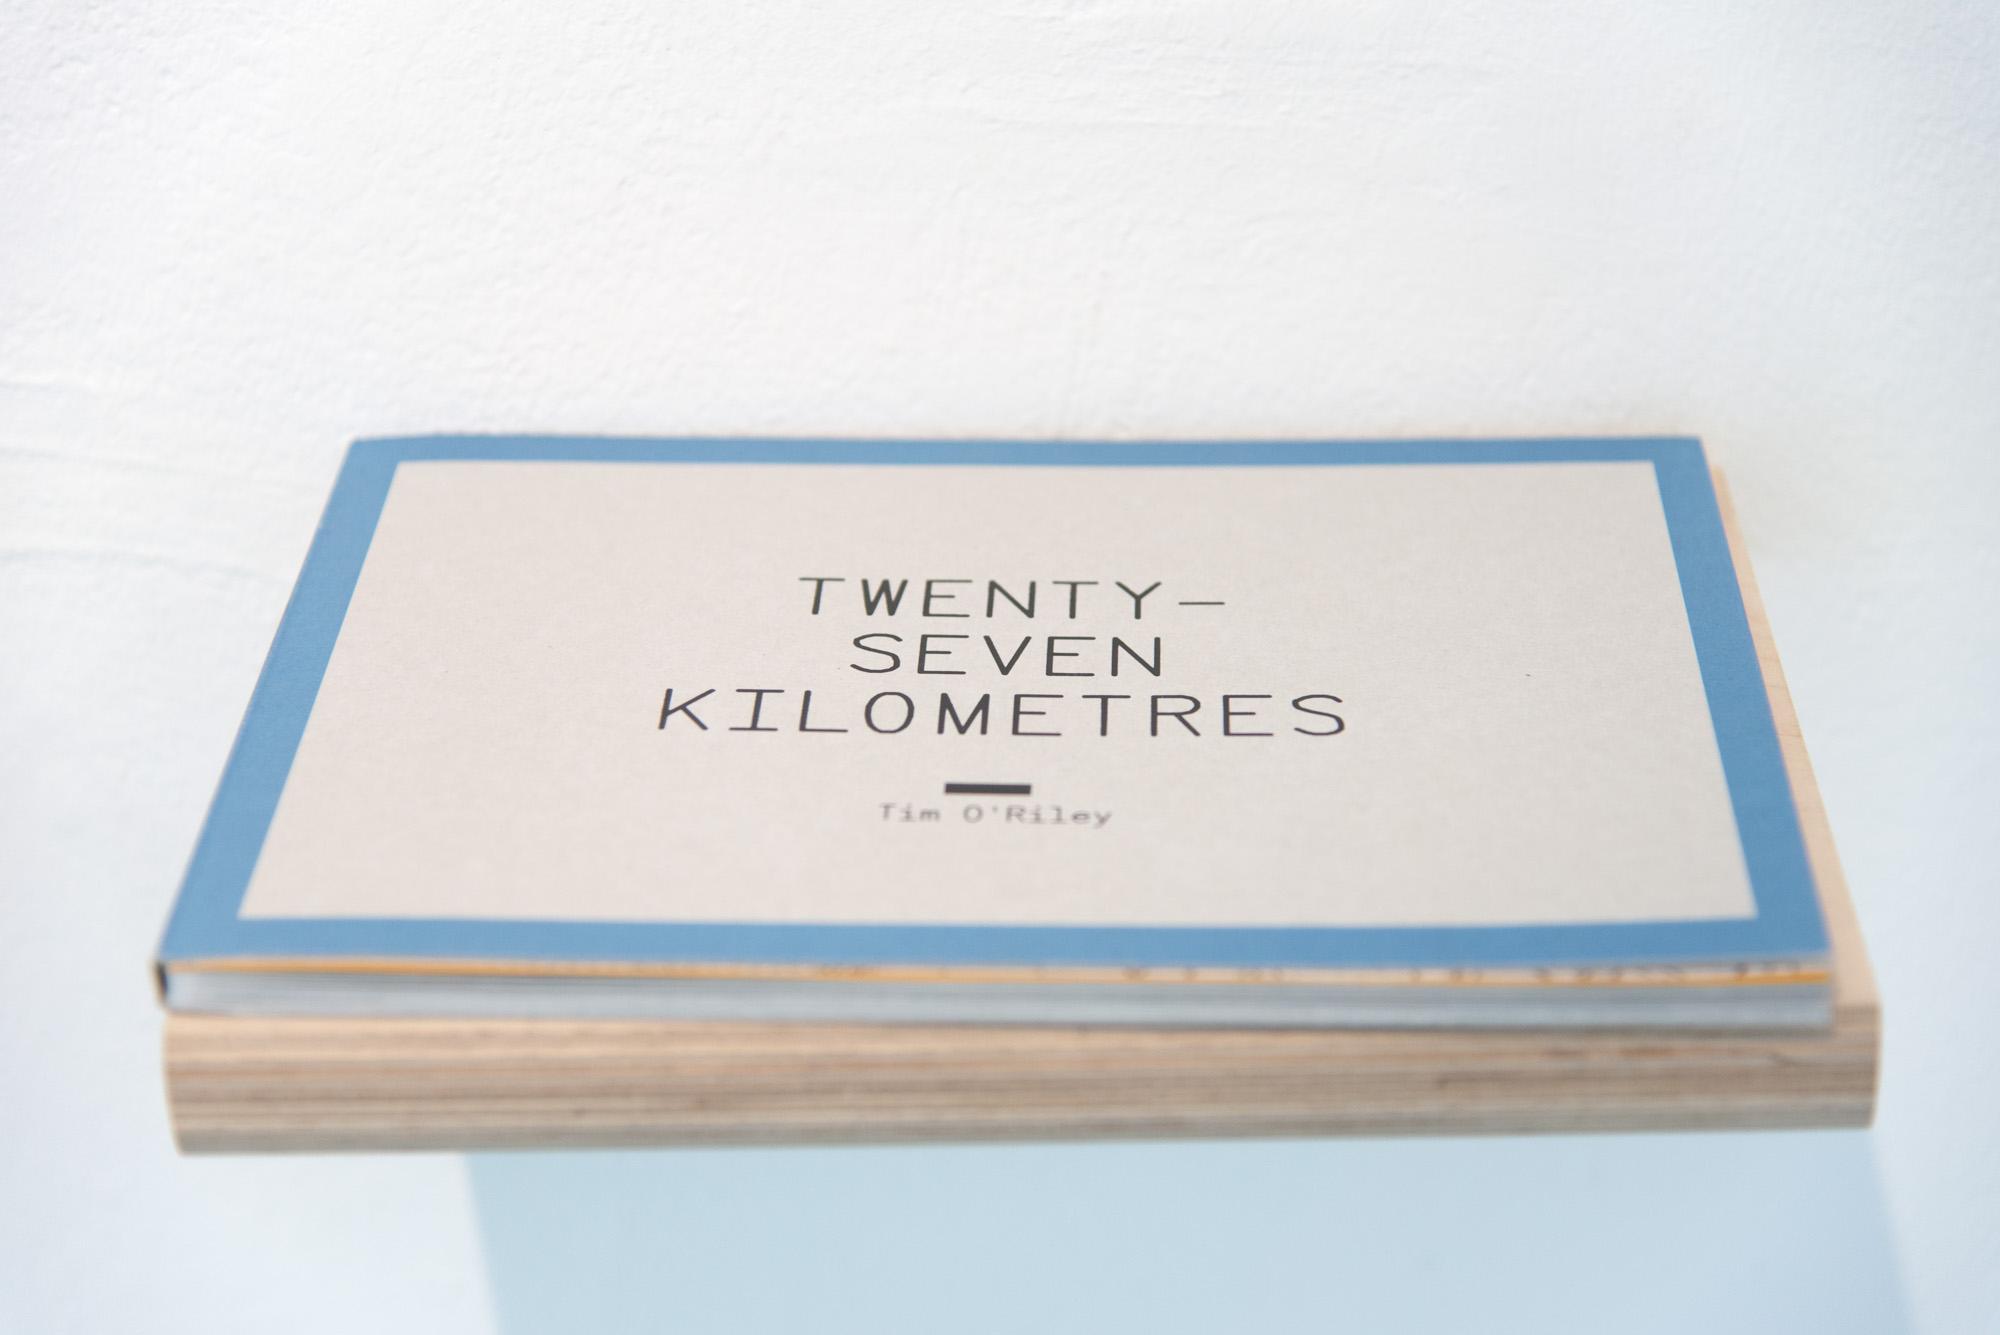 Twenty-Seven Kilometres, Tim O'Riley, 2013